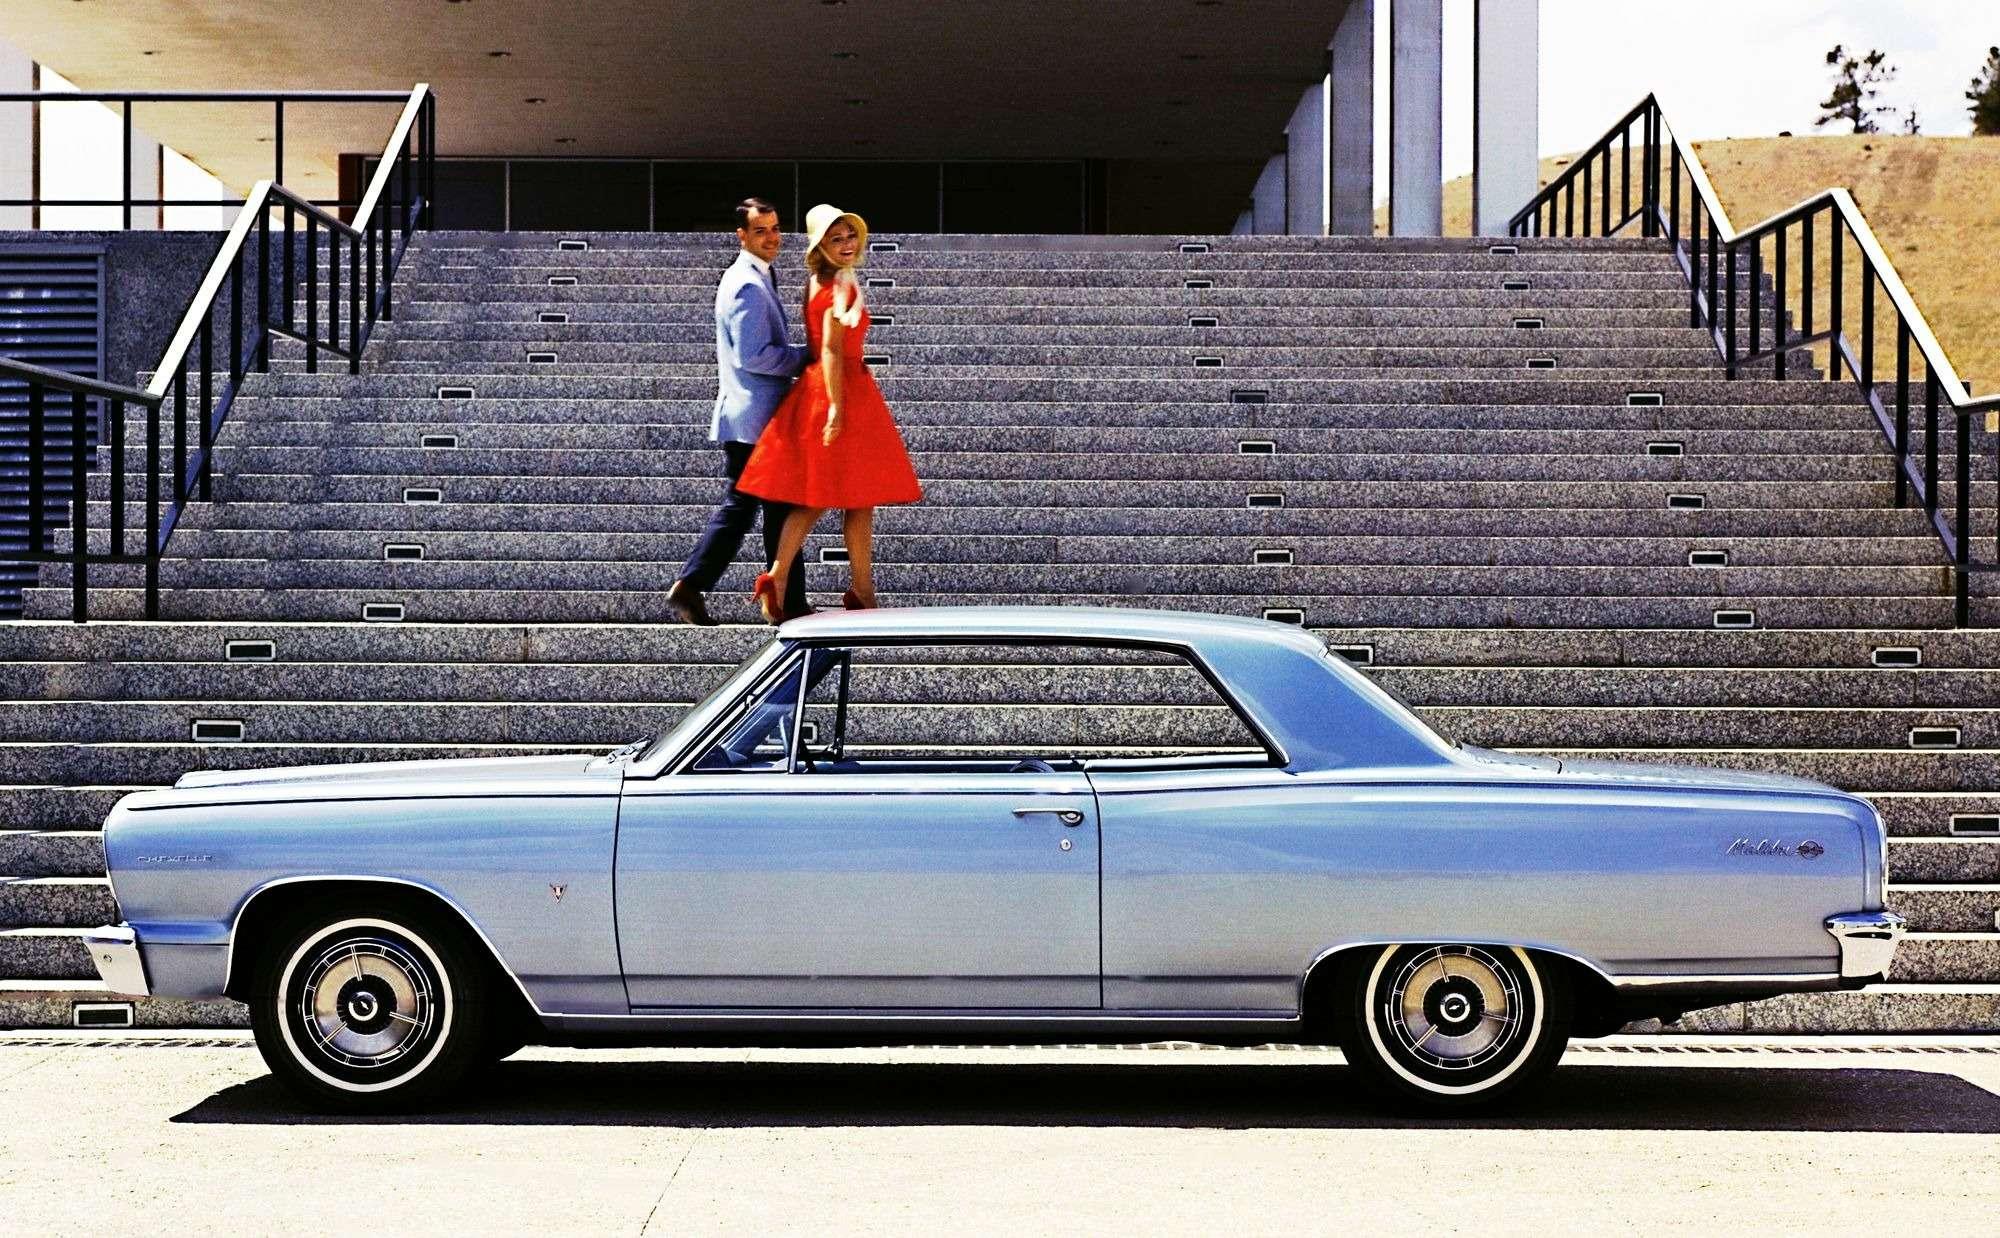 1964 Chevrolet Chevelle Malibu SSHardtop Coupe